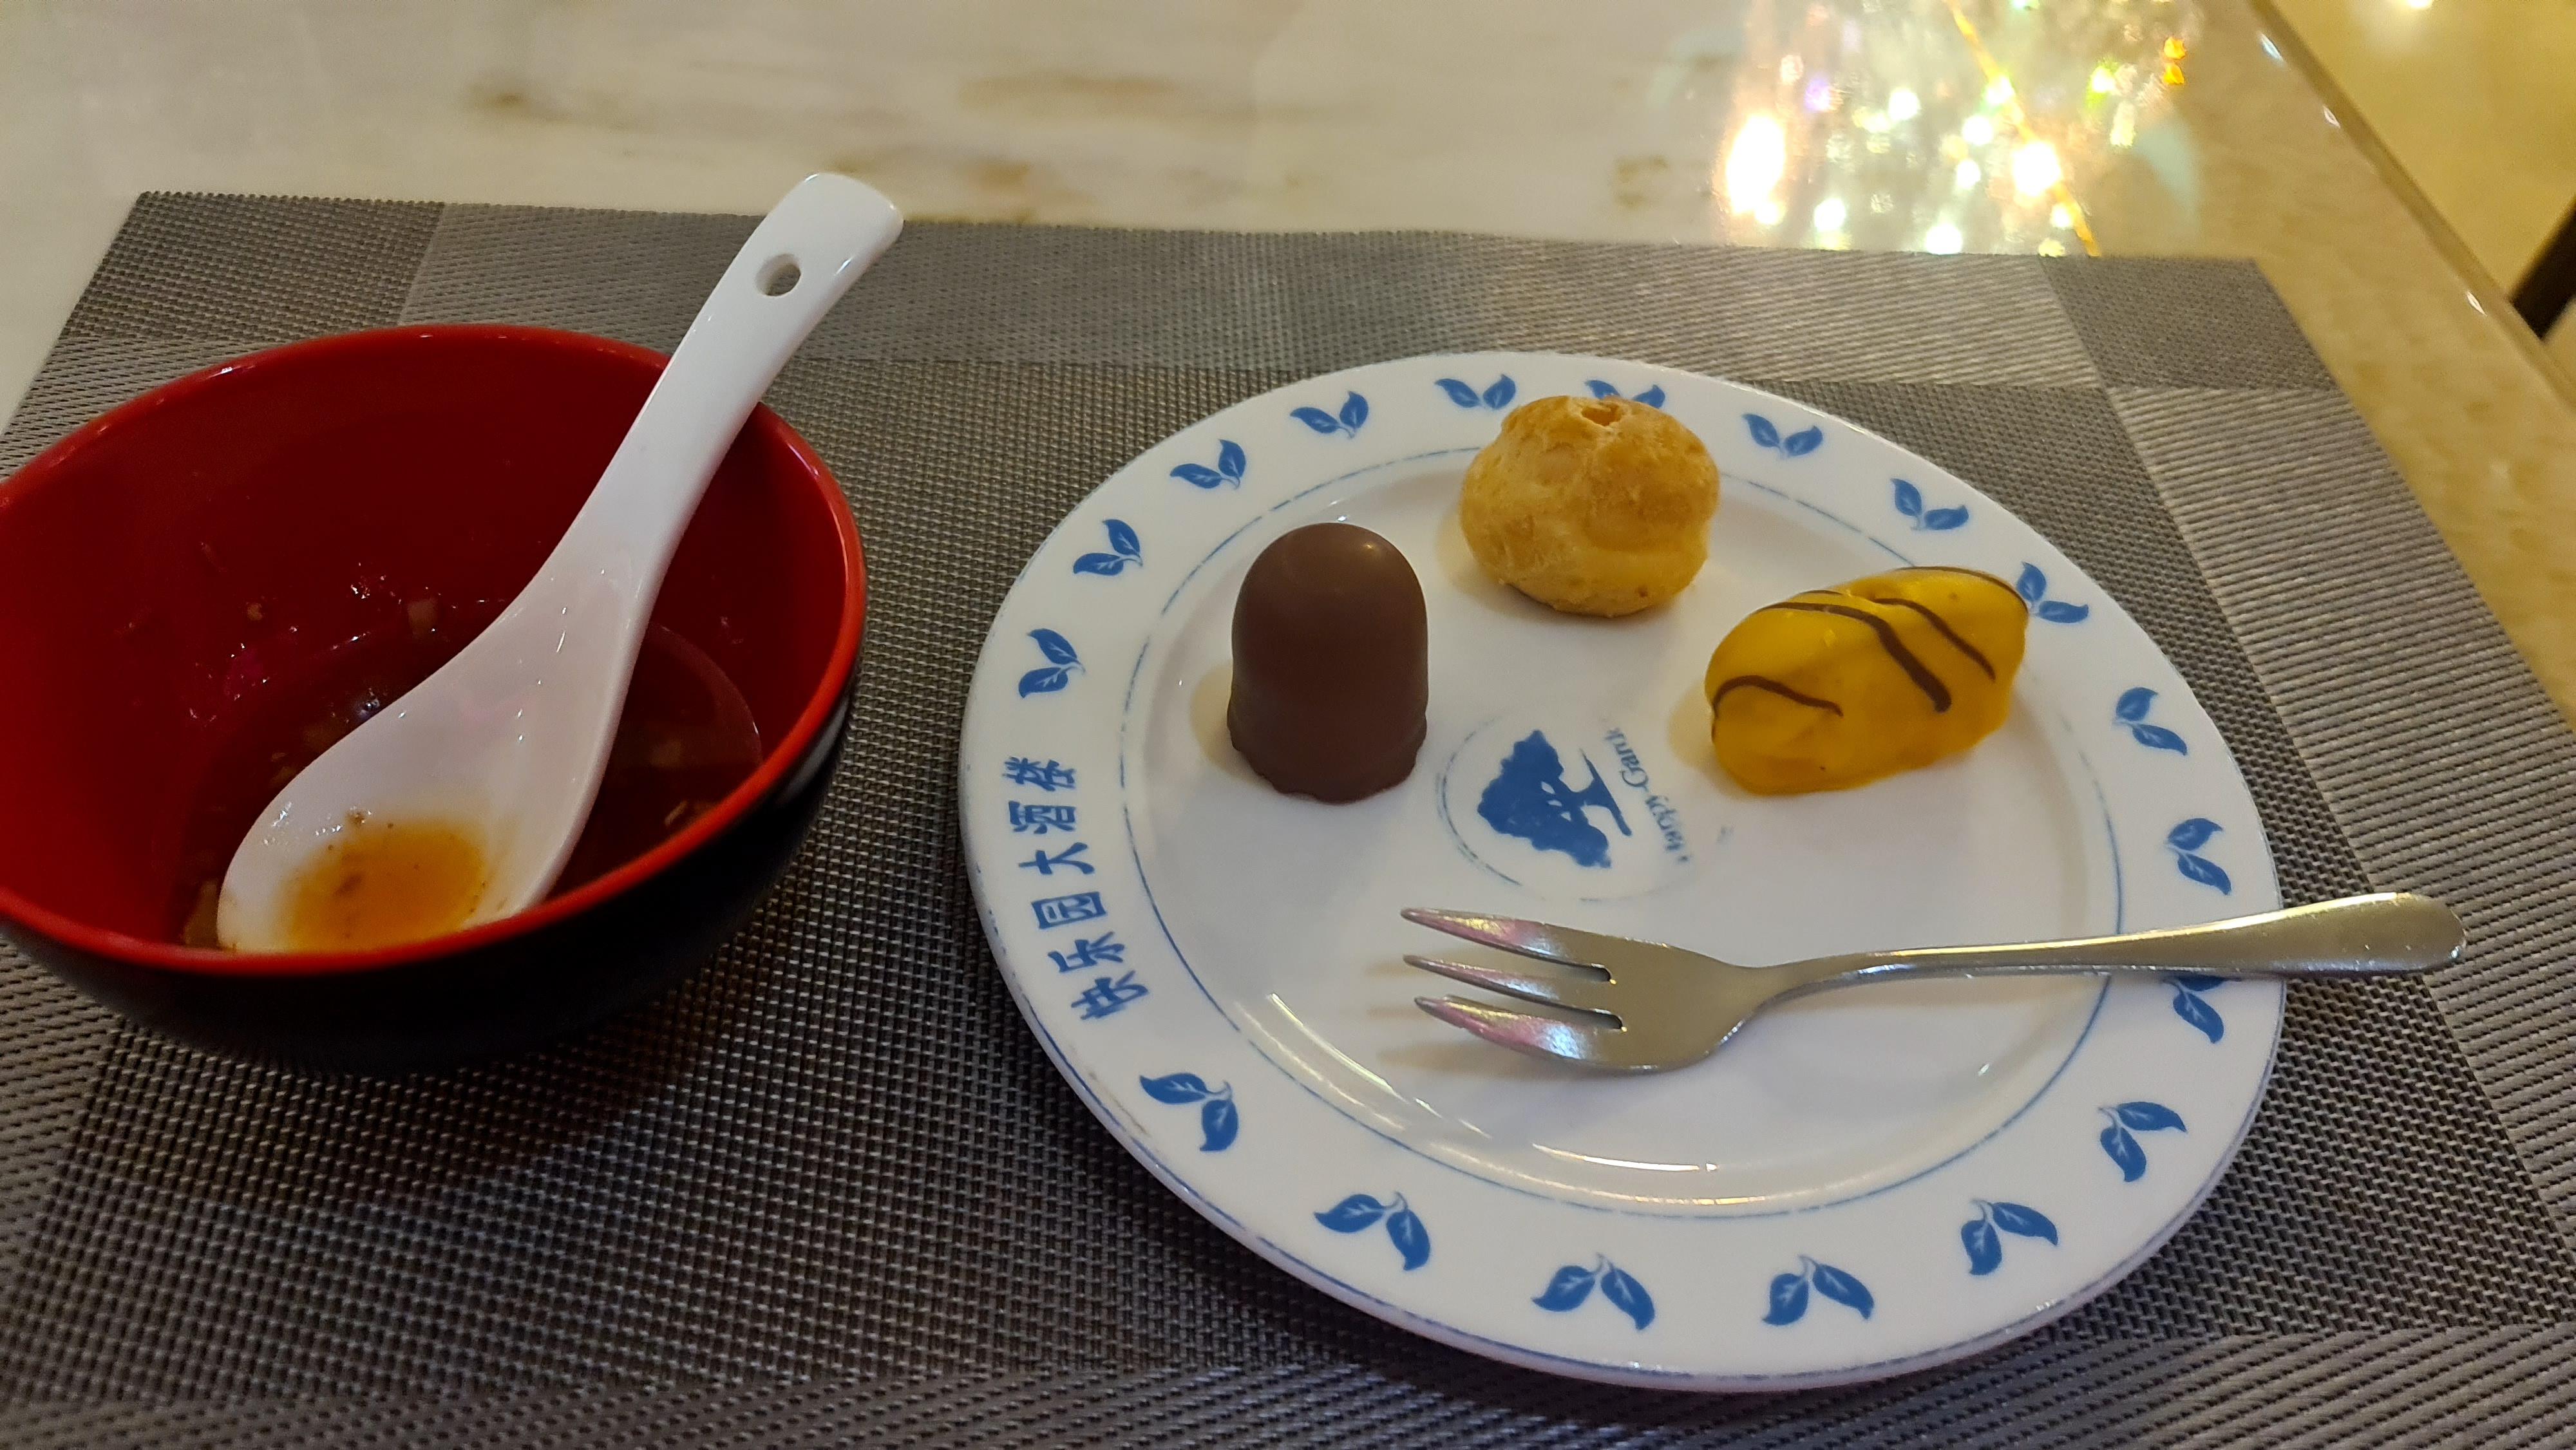 https://foodloader.net/Holz_2020-10-07_Chinese_3.jpg